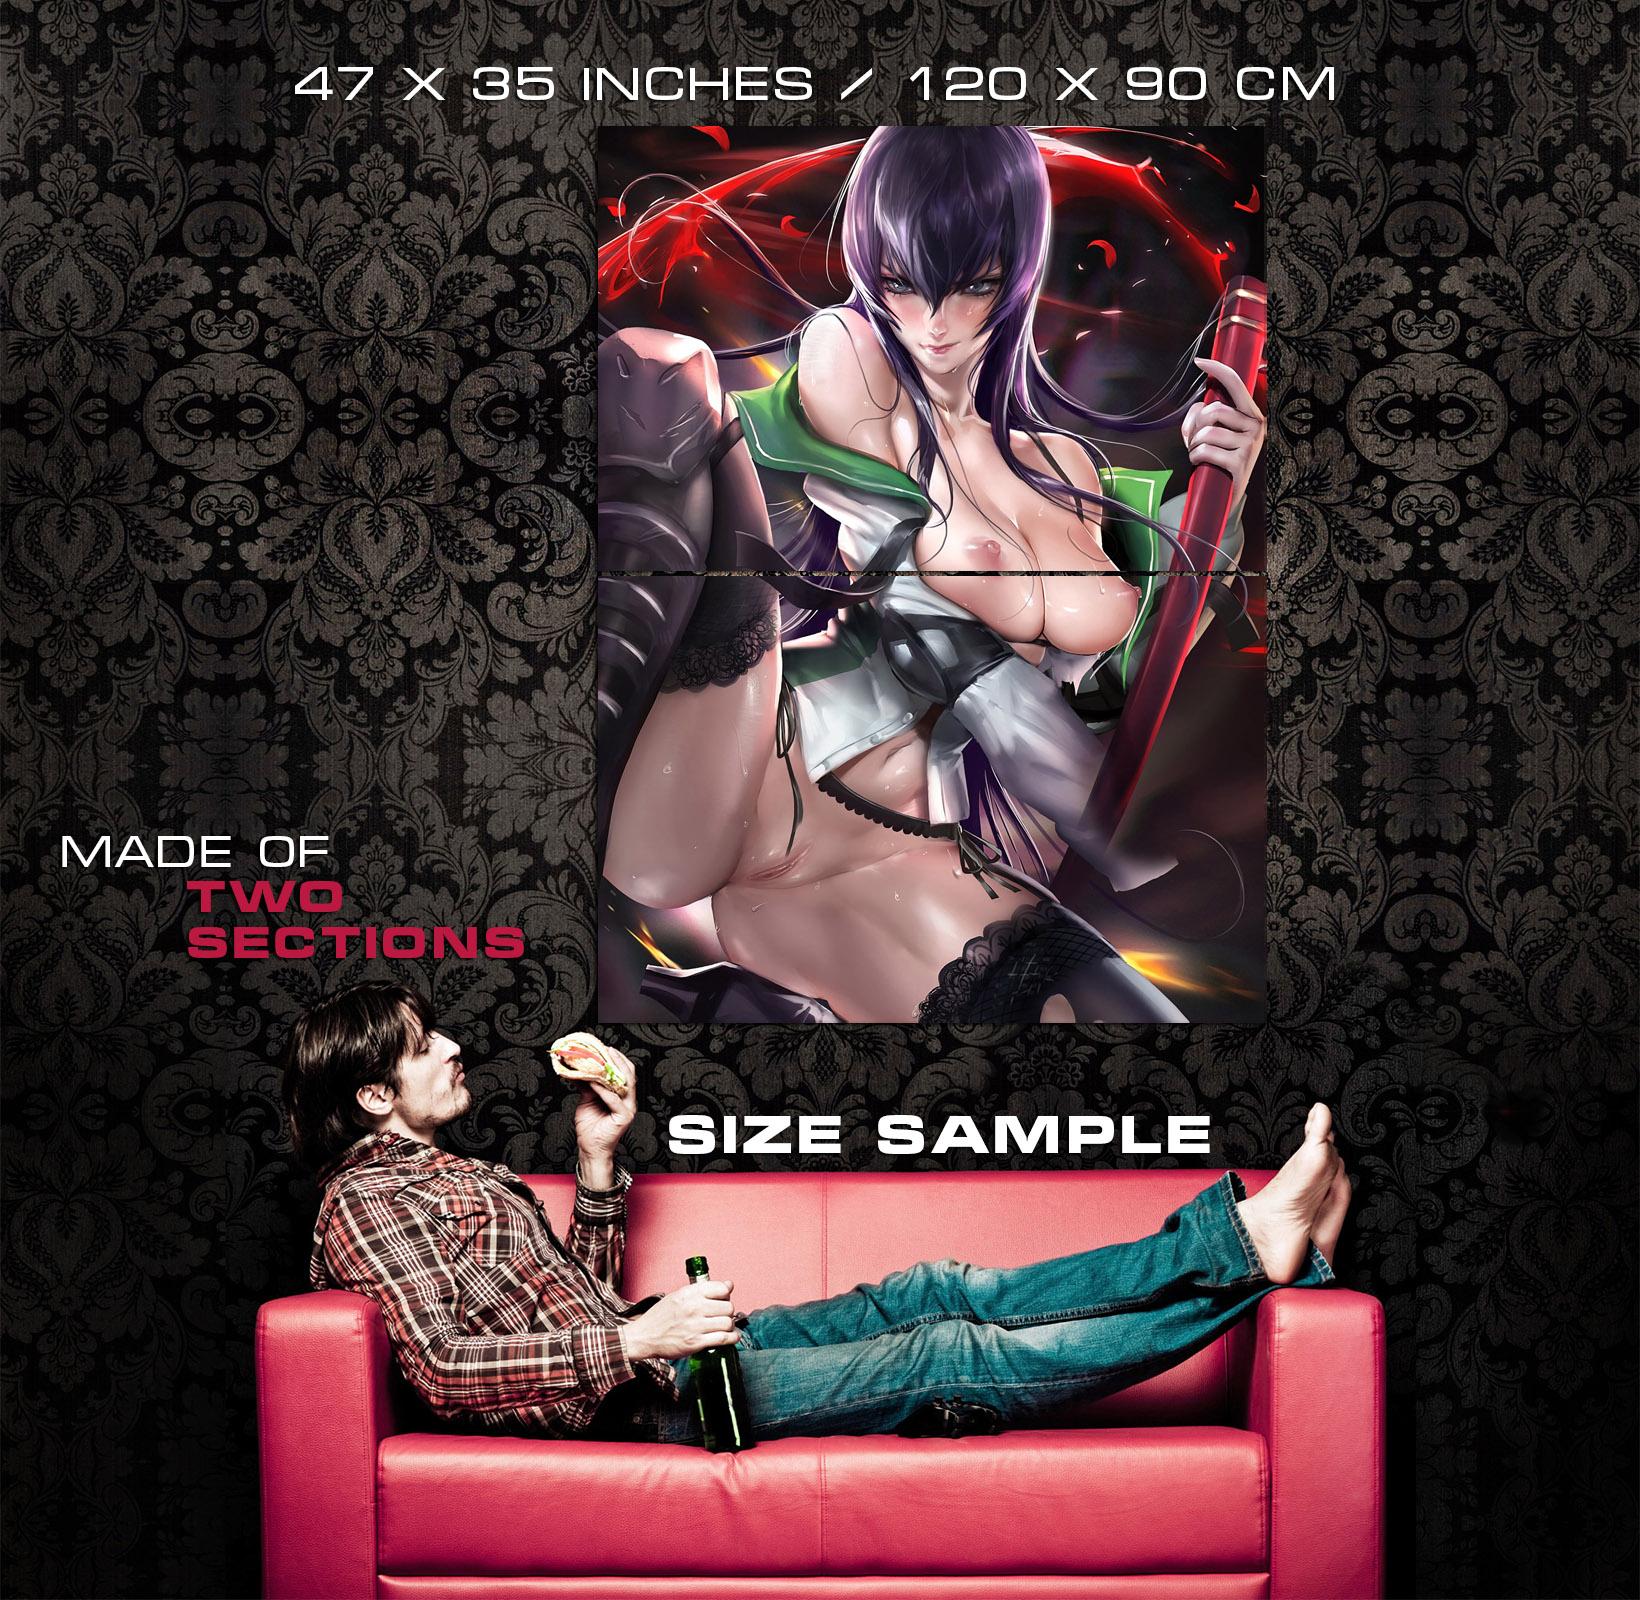 Highschool-Of-The-Dead-2-Busujima-Saeko-Sexy-Anime-Girl-Poster